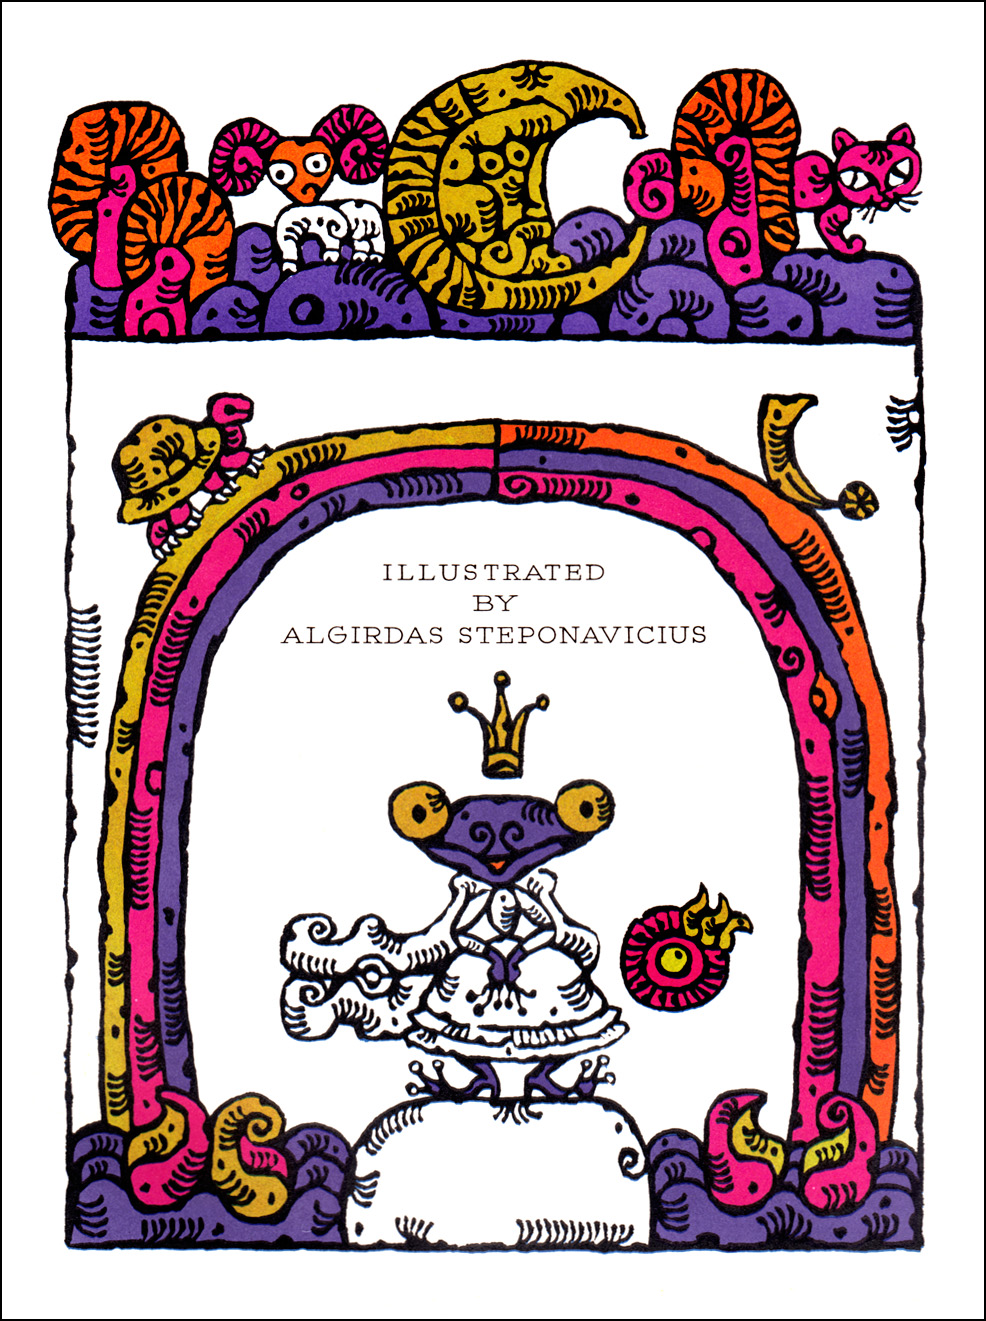 Algirdas Steponavicius, The Frog Queen